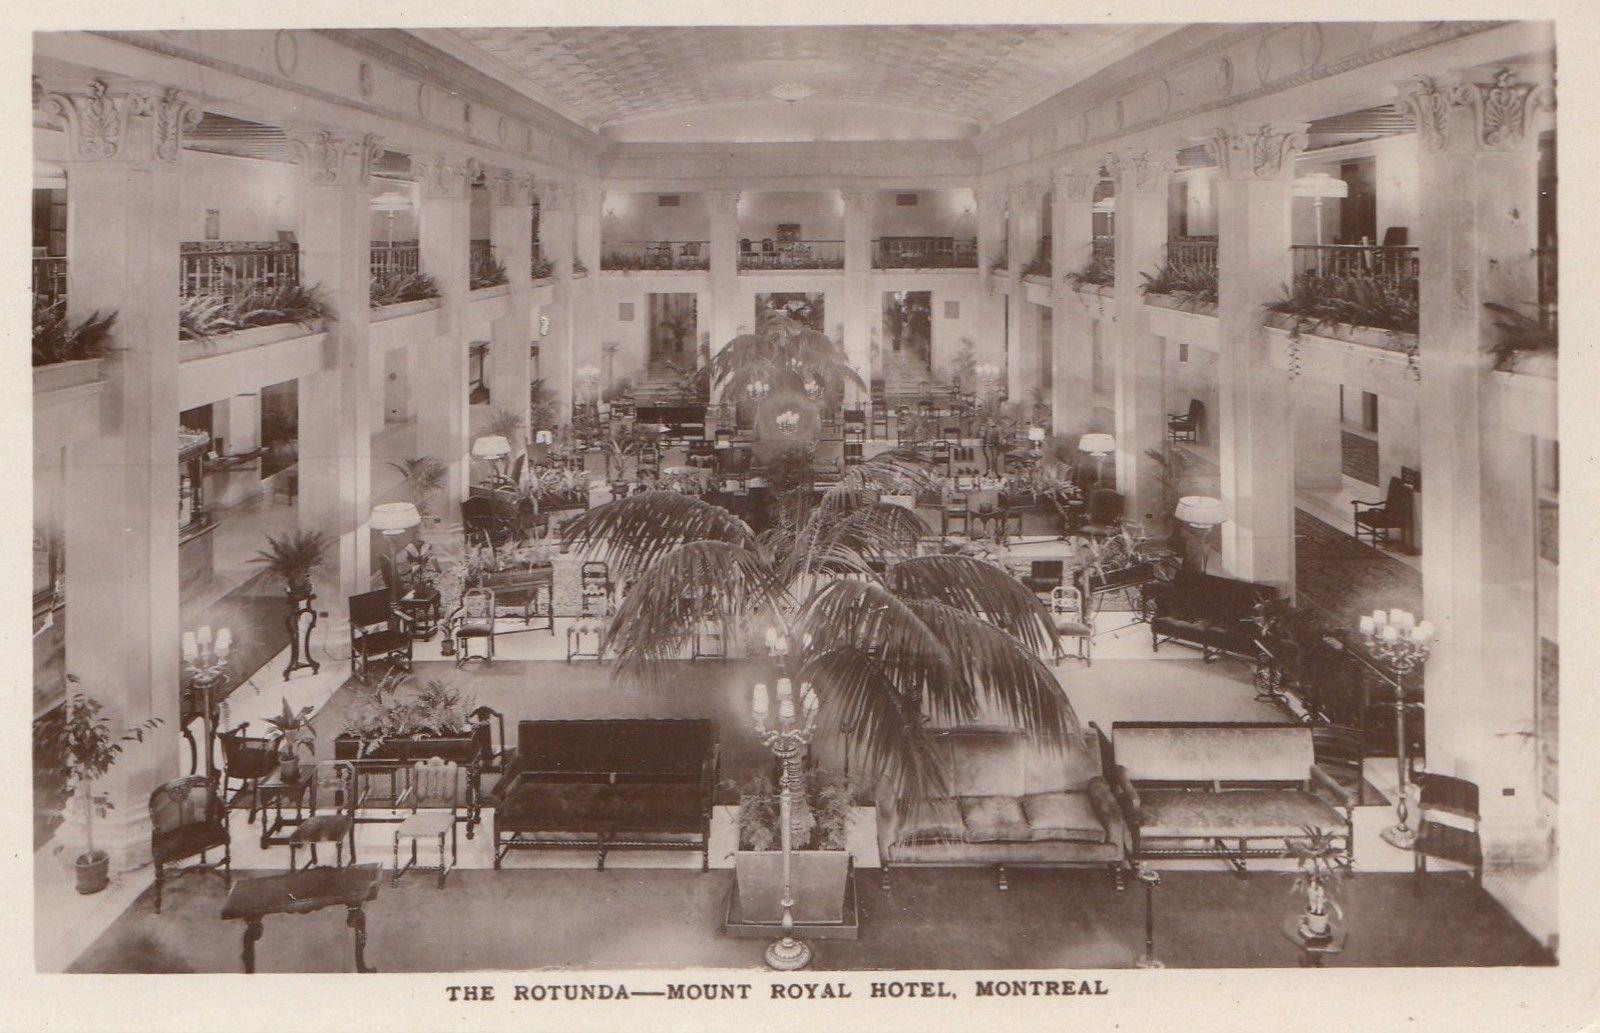 Rotunda Mont Royal Hotel Montreal Quebec 1920 30s International Fine Art Co Rppc Collectibles